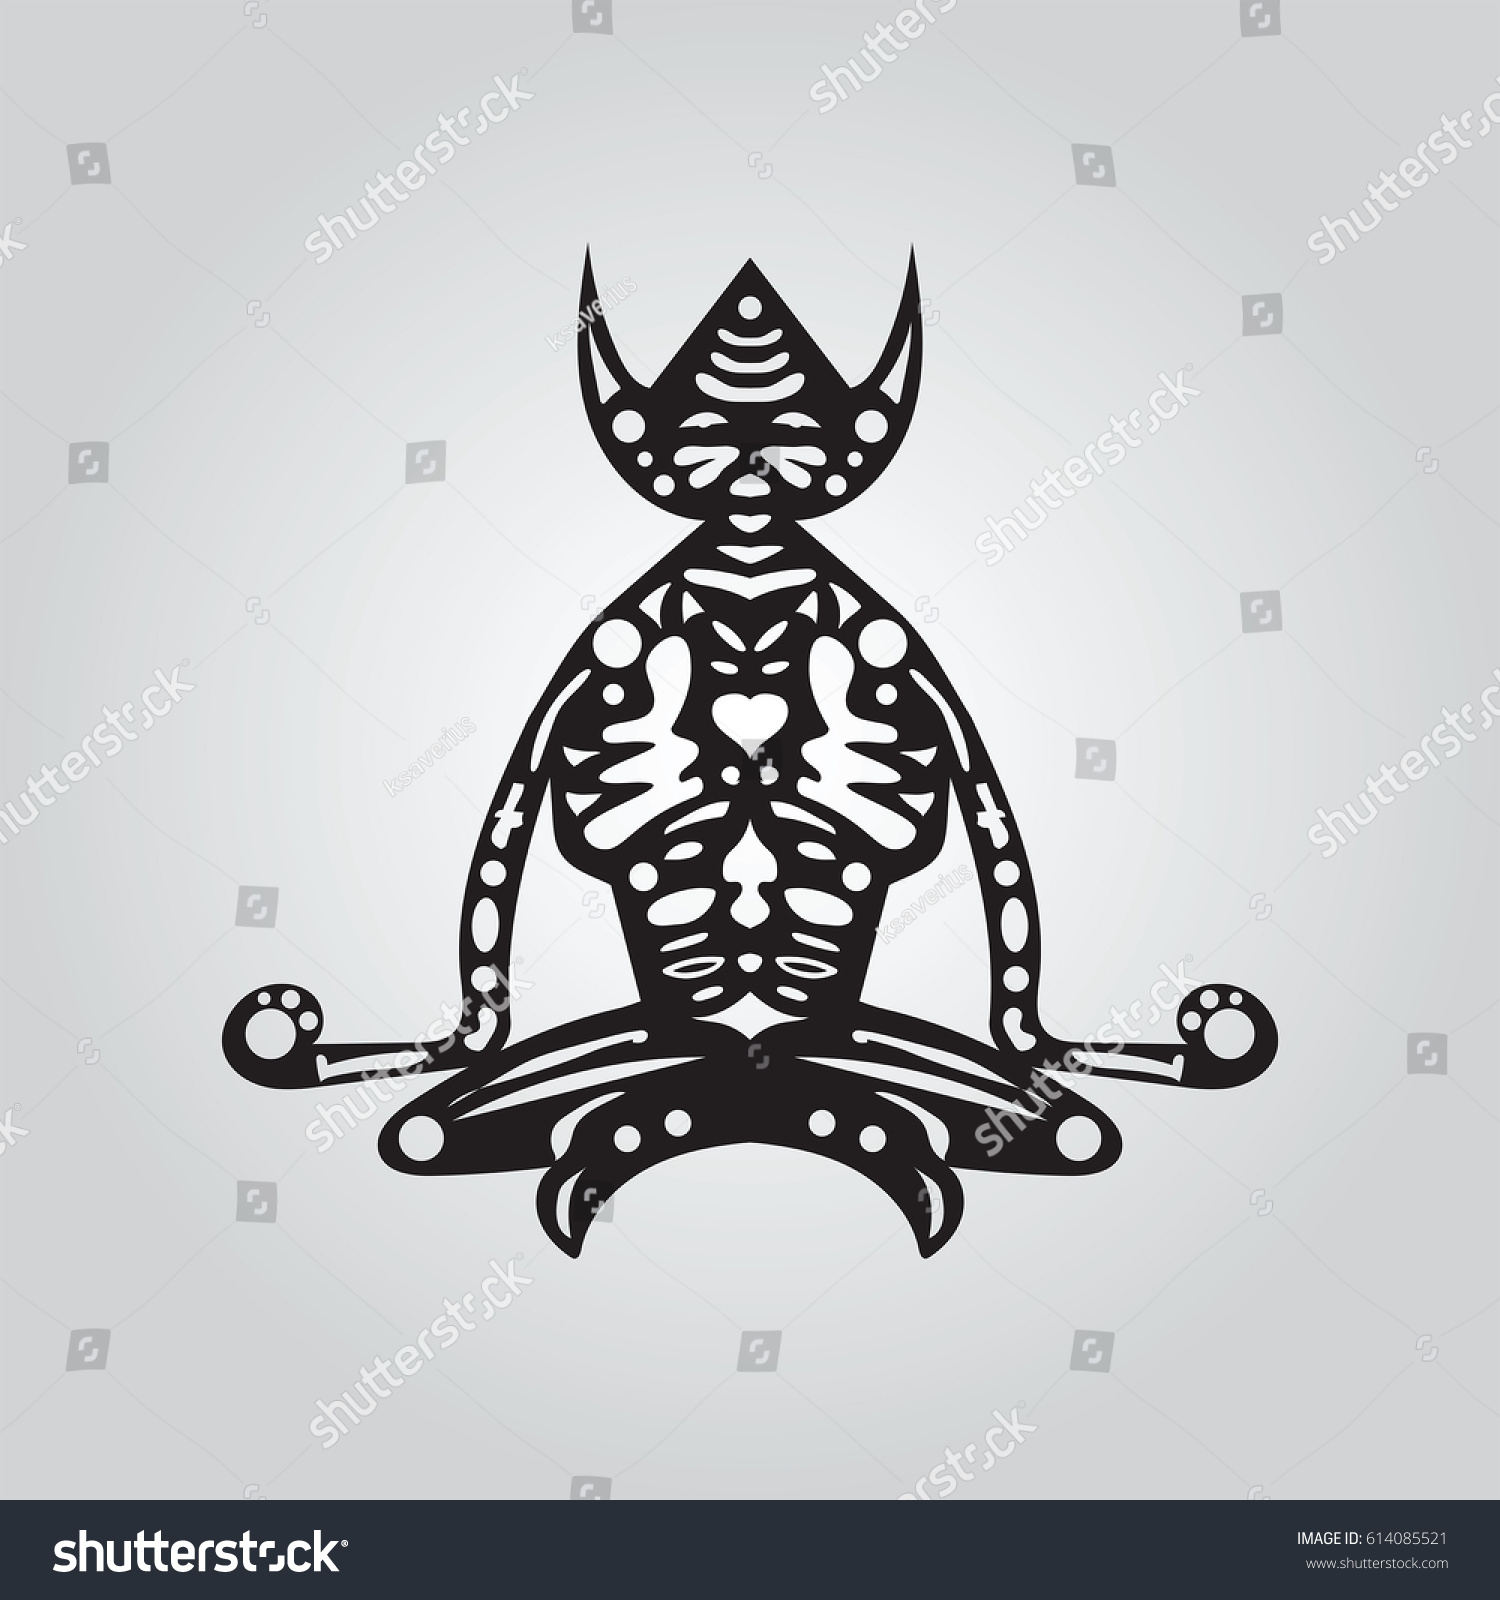 Lars krutak tatu lu tattoos from the dreamtime lars krutak - Vector Indigene Character Ancient Aboriginal Stock Vector